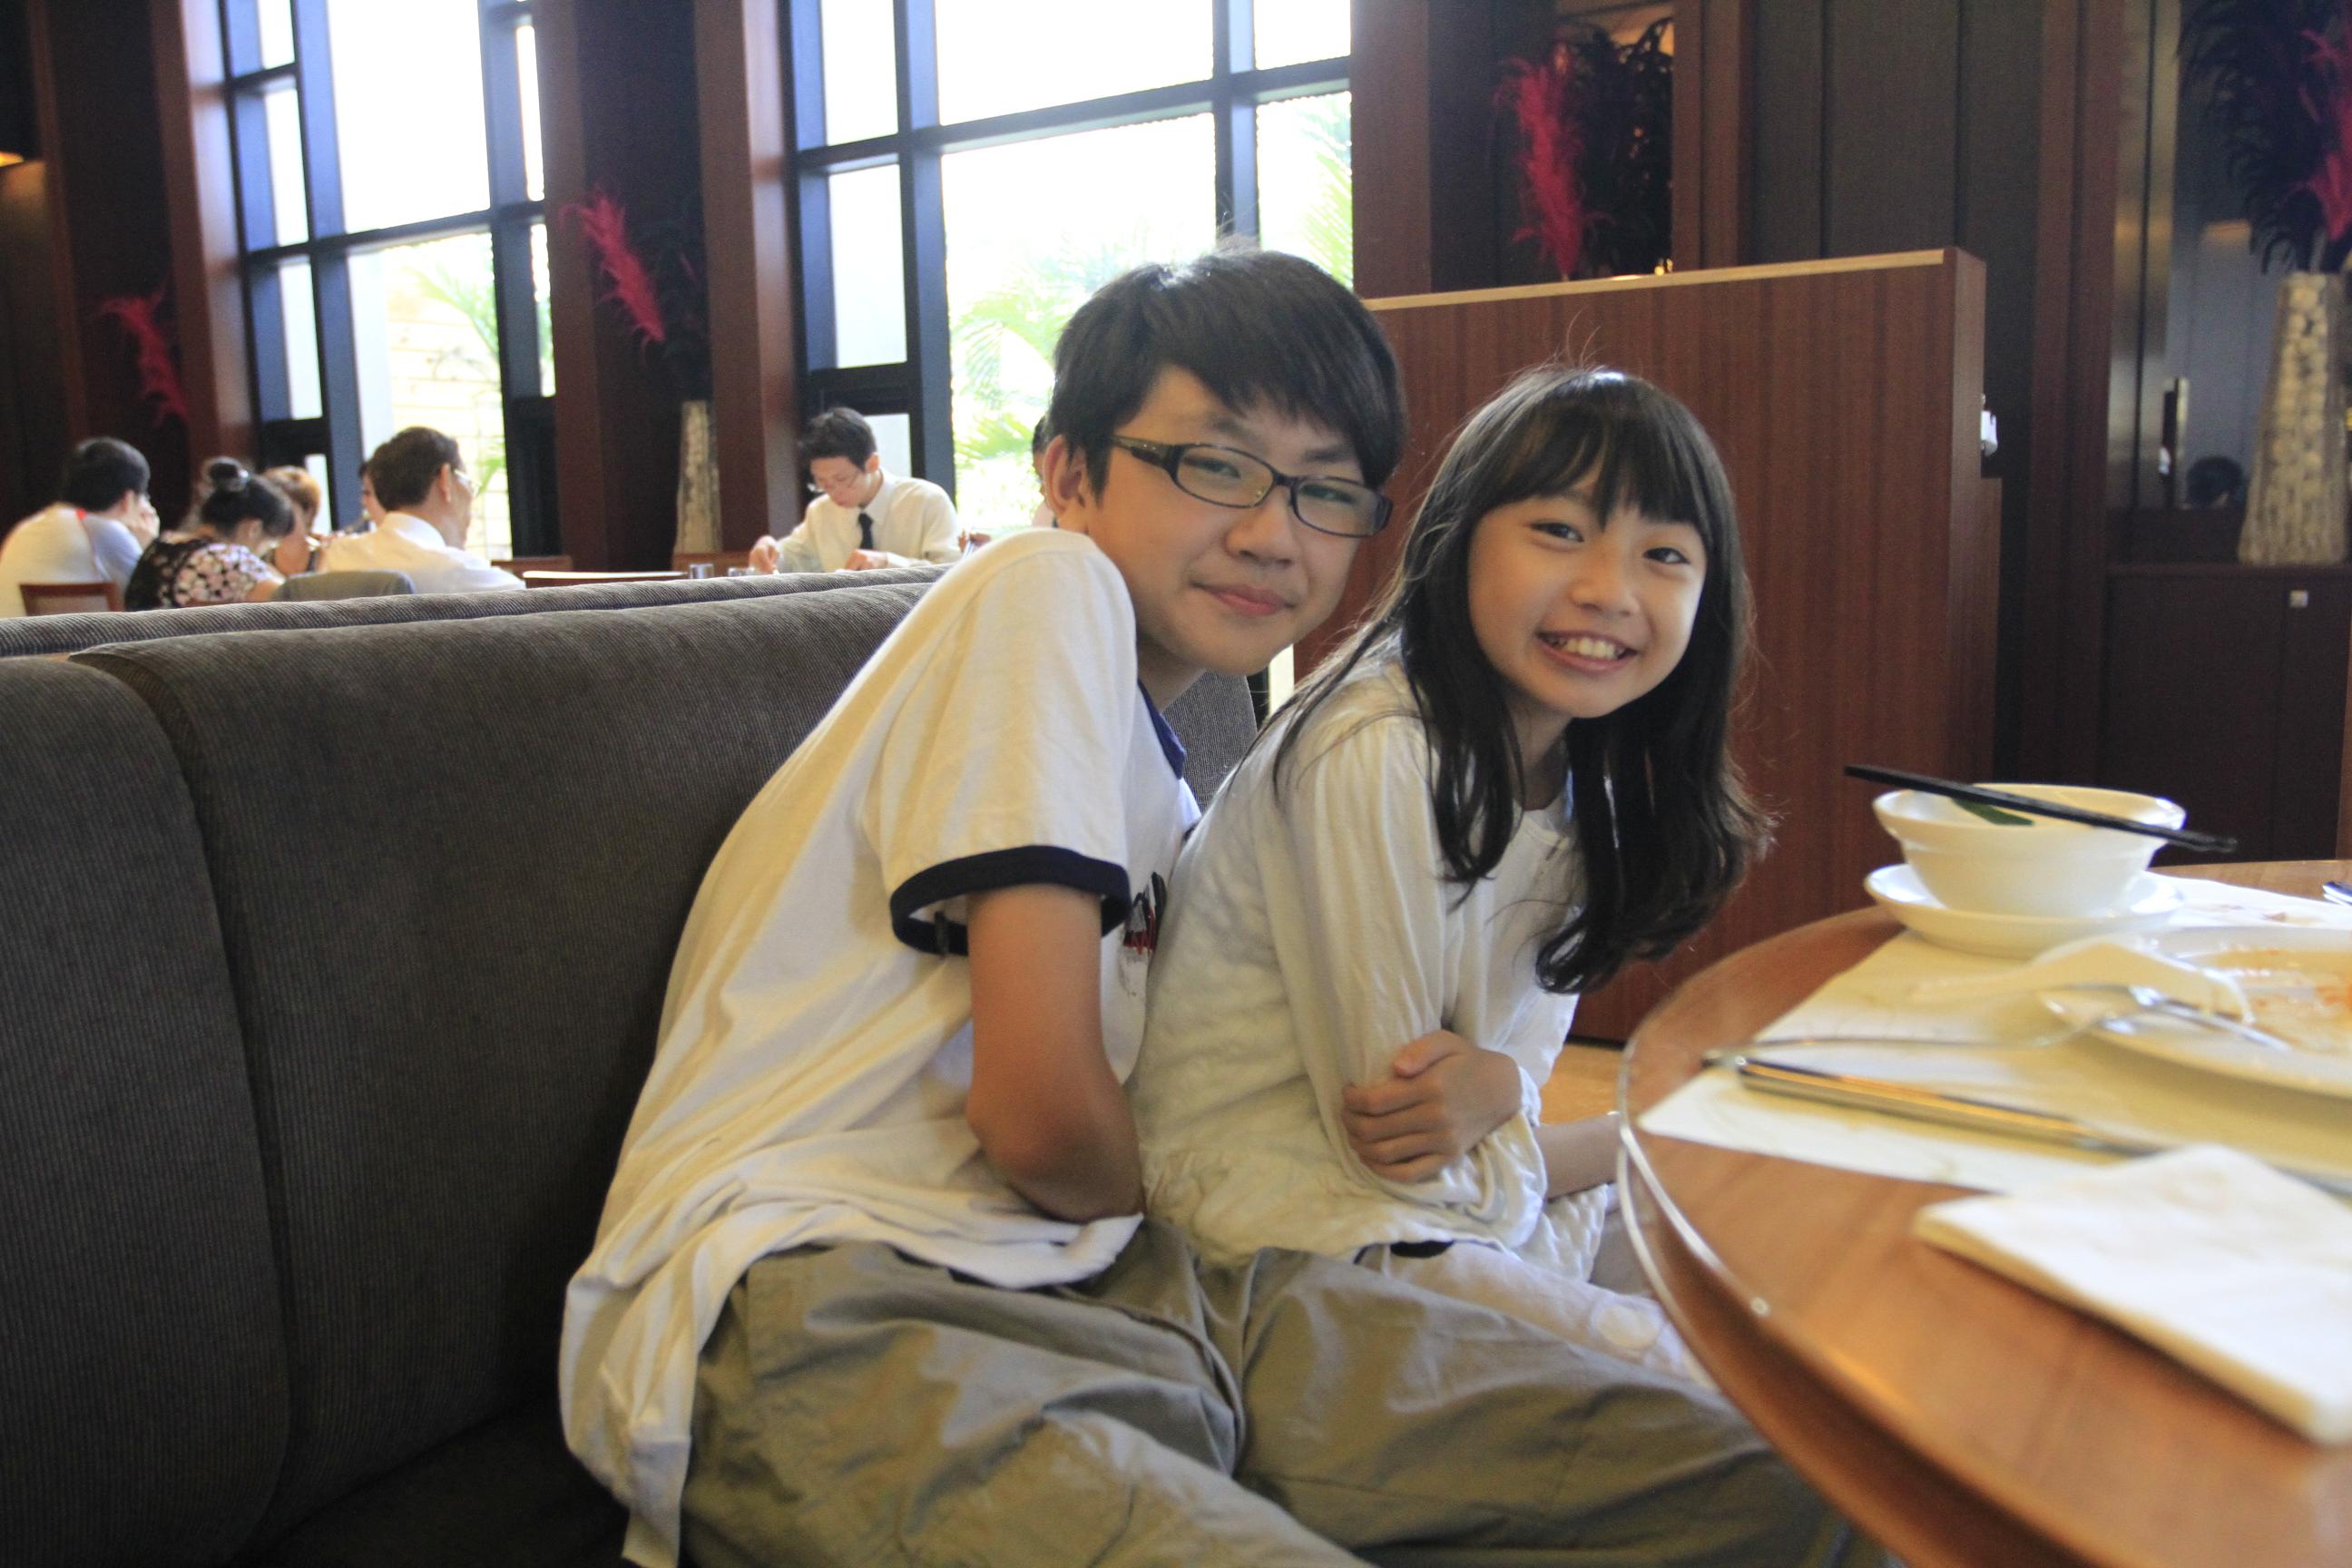 【JS】女子小学生 高学年画像スレPart38【JS】 [無断転載禁止]©bbspink.comfc2>1本 YouTube動画>7本 ->画像>1092枚